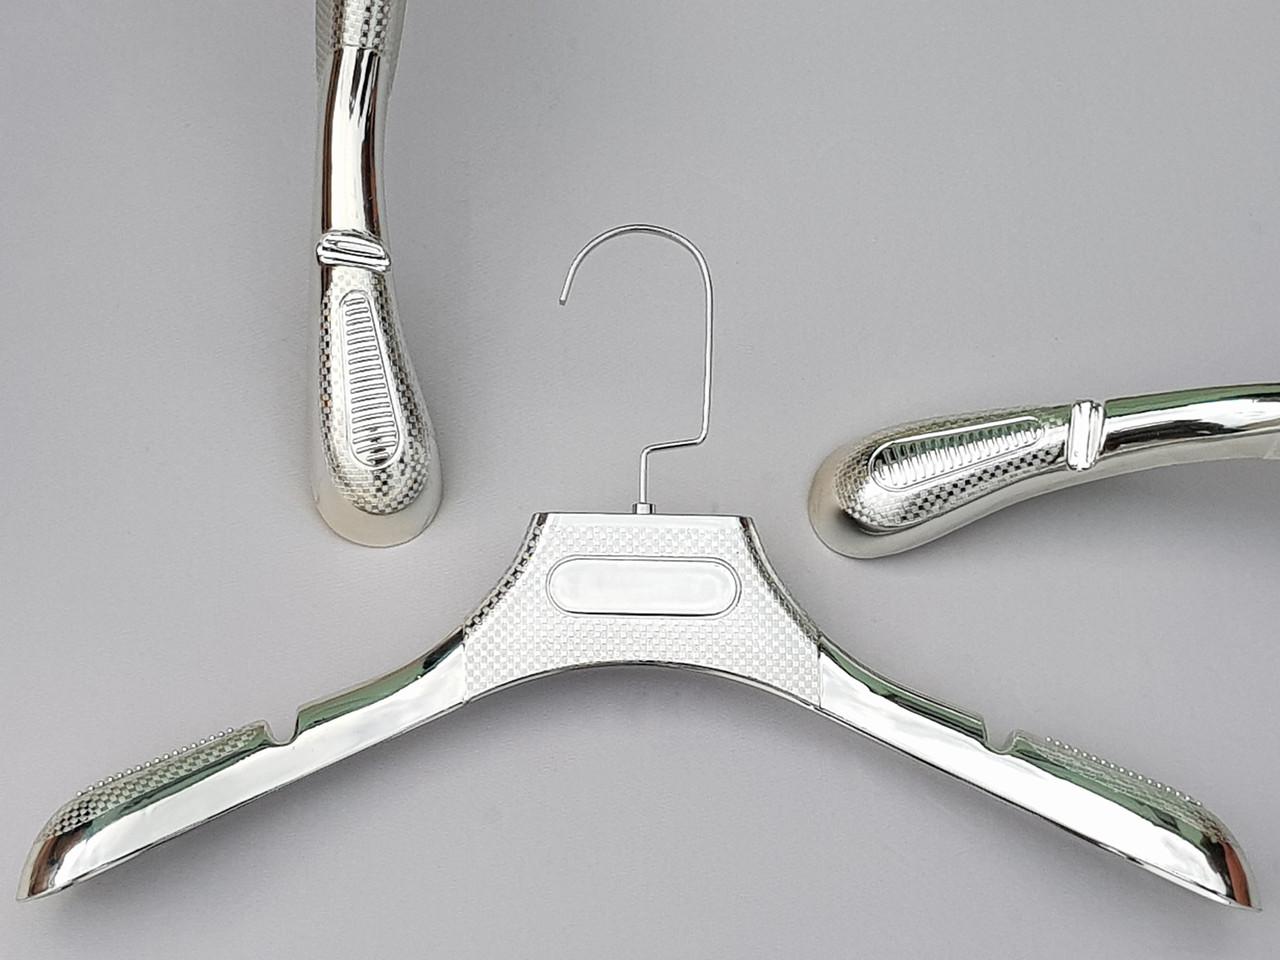 Плечики вешалки тремпеля серебристого цвета с антискользящим ребристым плечом, длина 39 см